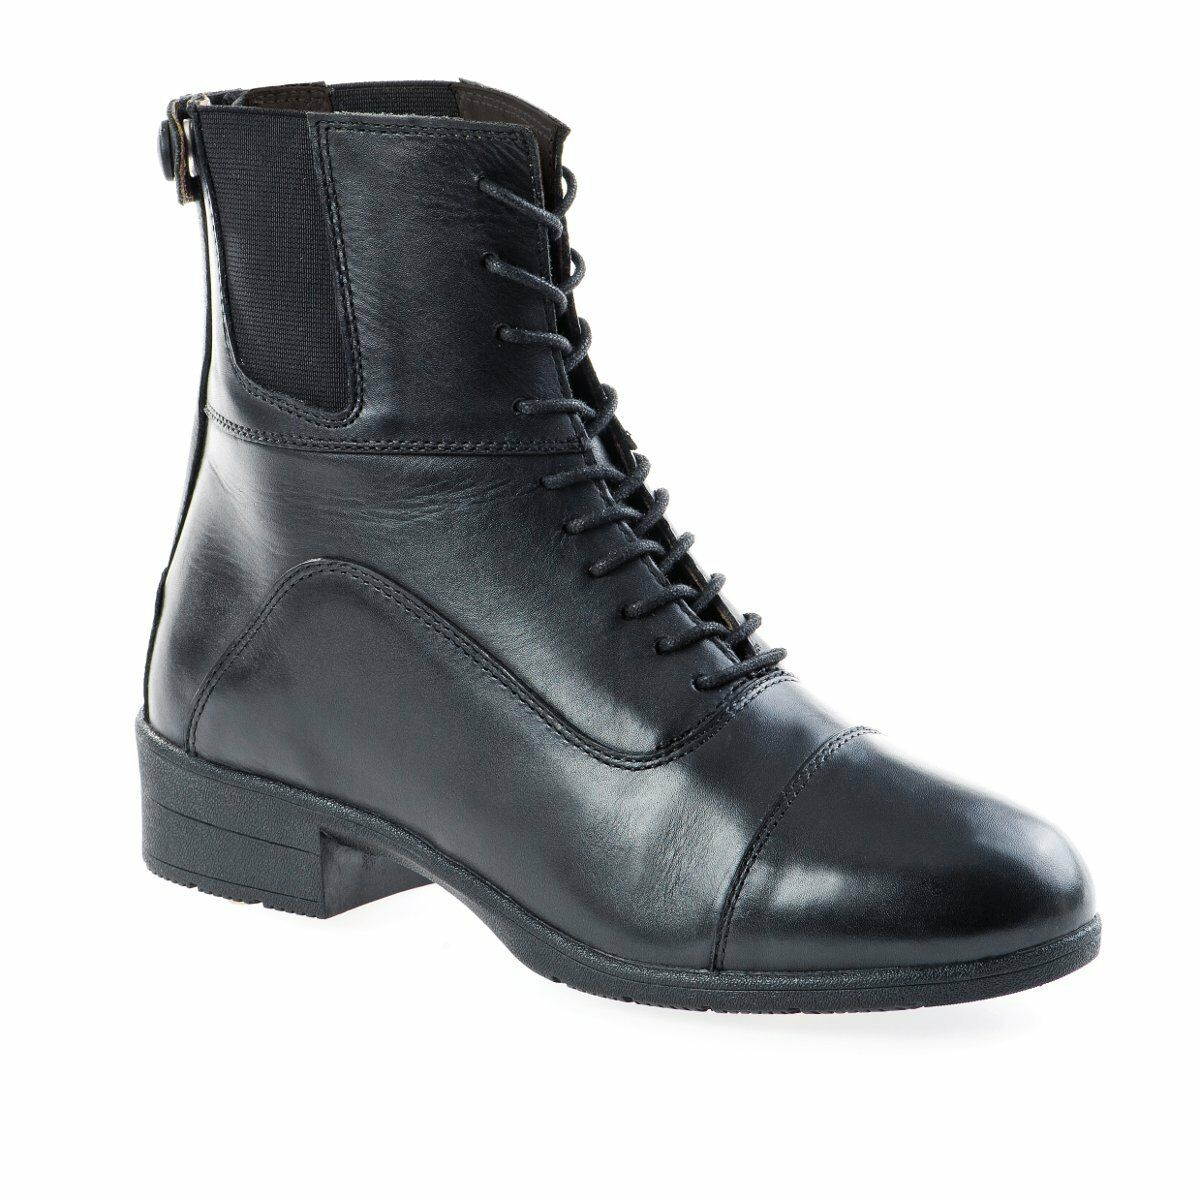 SUEDWIND Stiefel Ancona CONTRACE Waterproof black Reitstiefel Lederstiefel